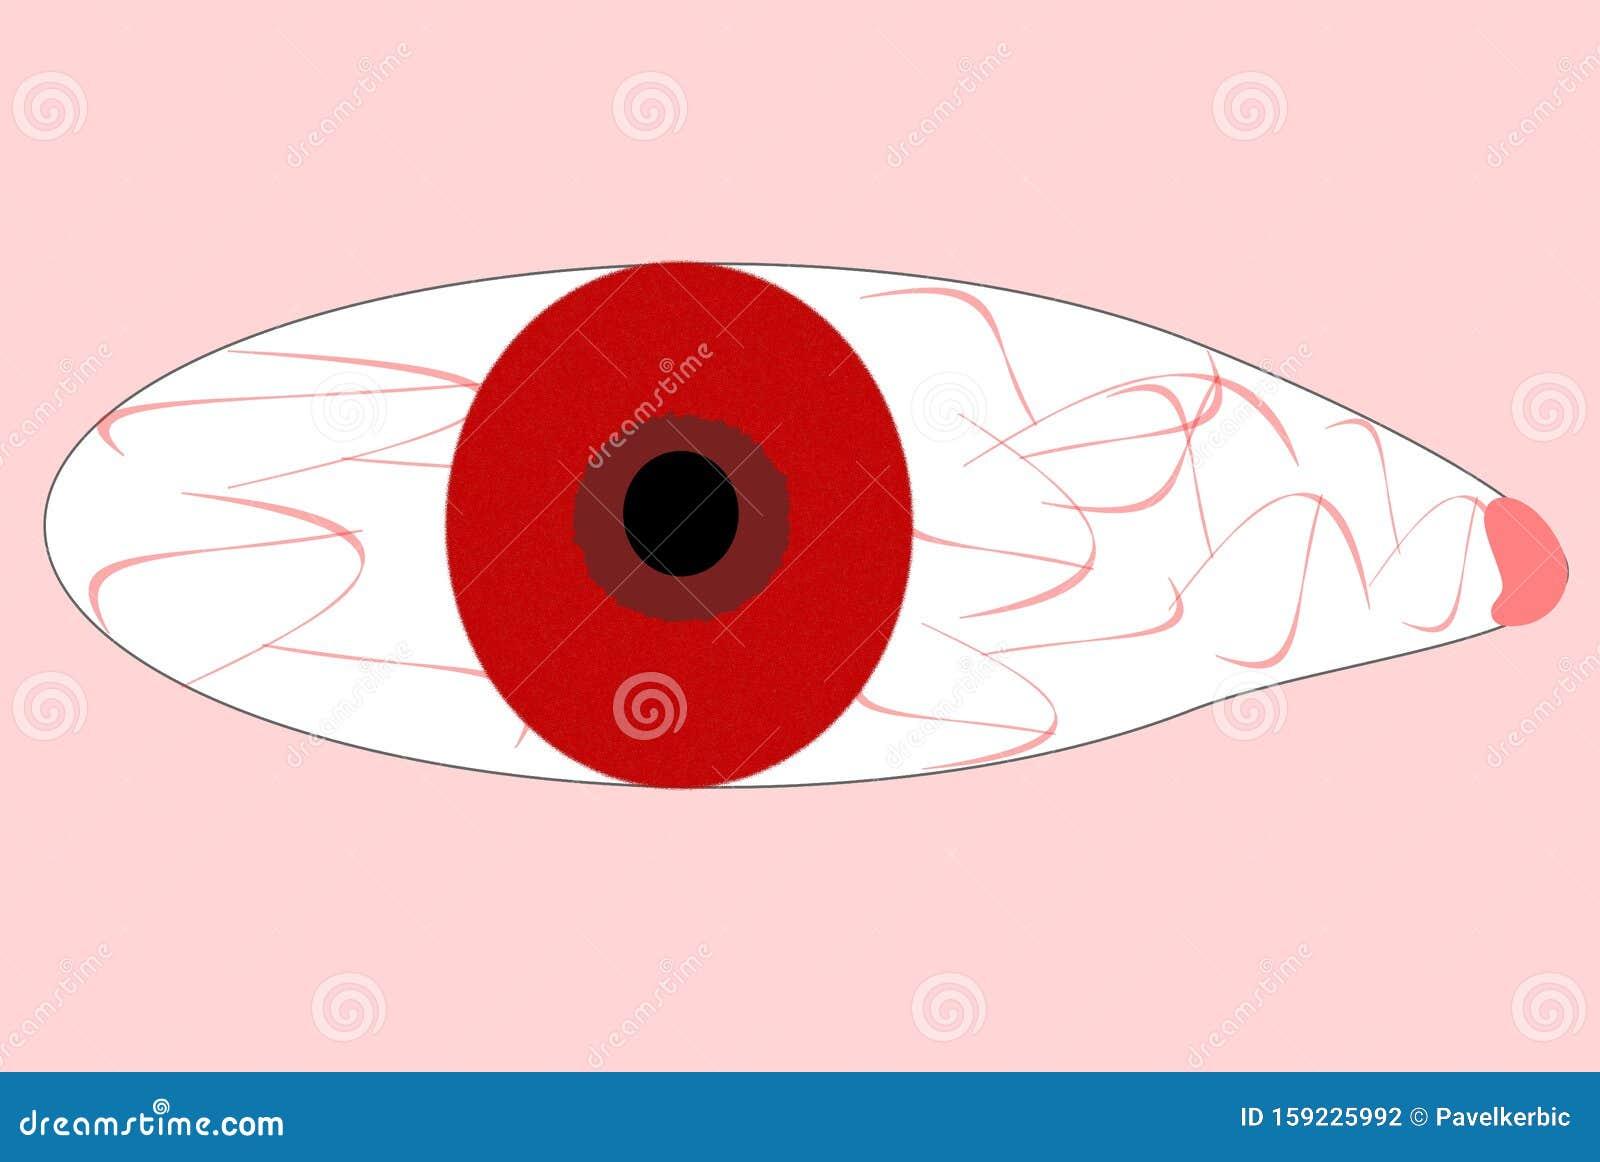 Albino Eye, Rotes Auge Einer Person Stock Abbildung   Illustration ...